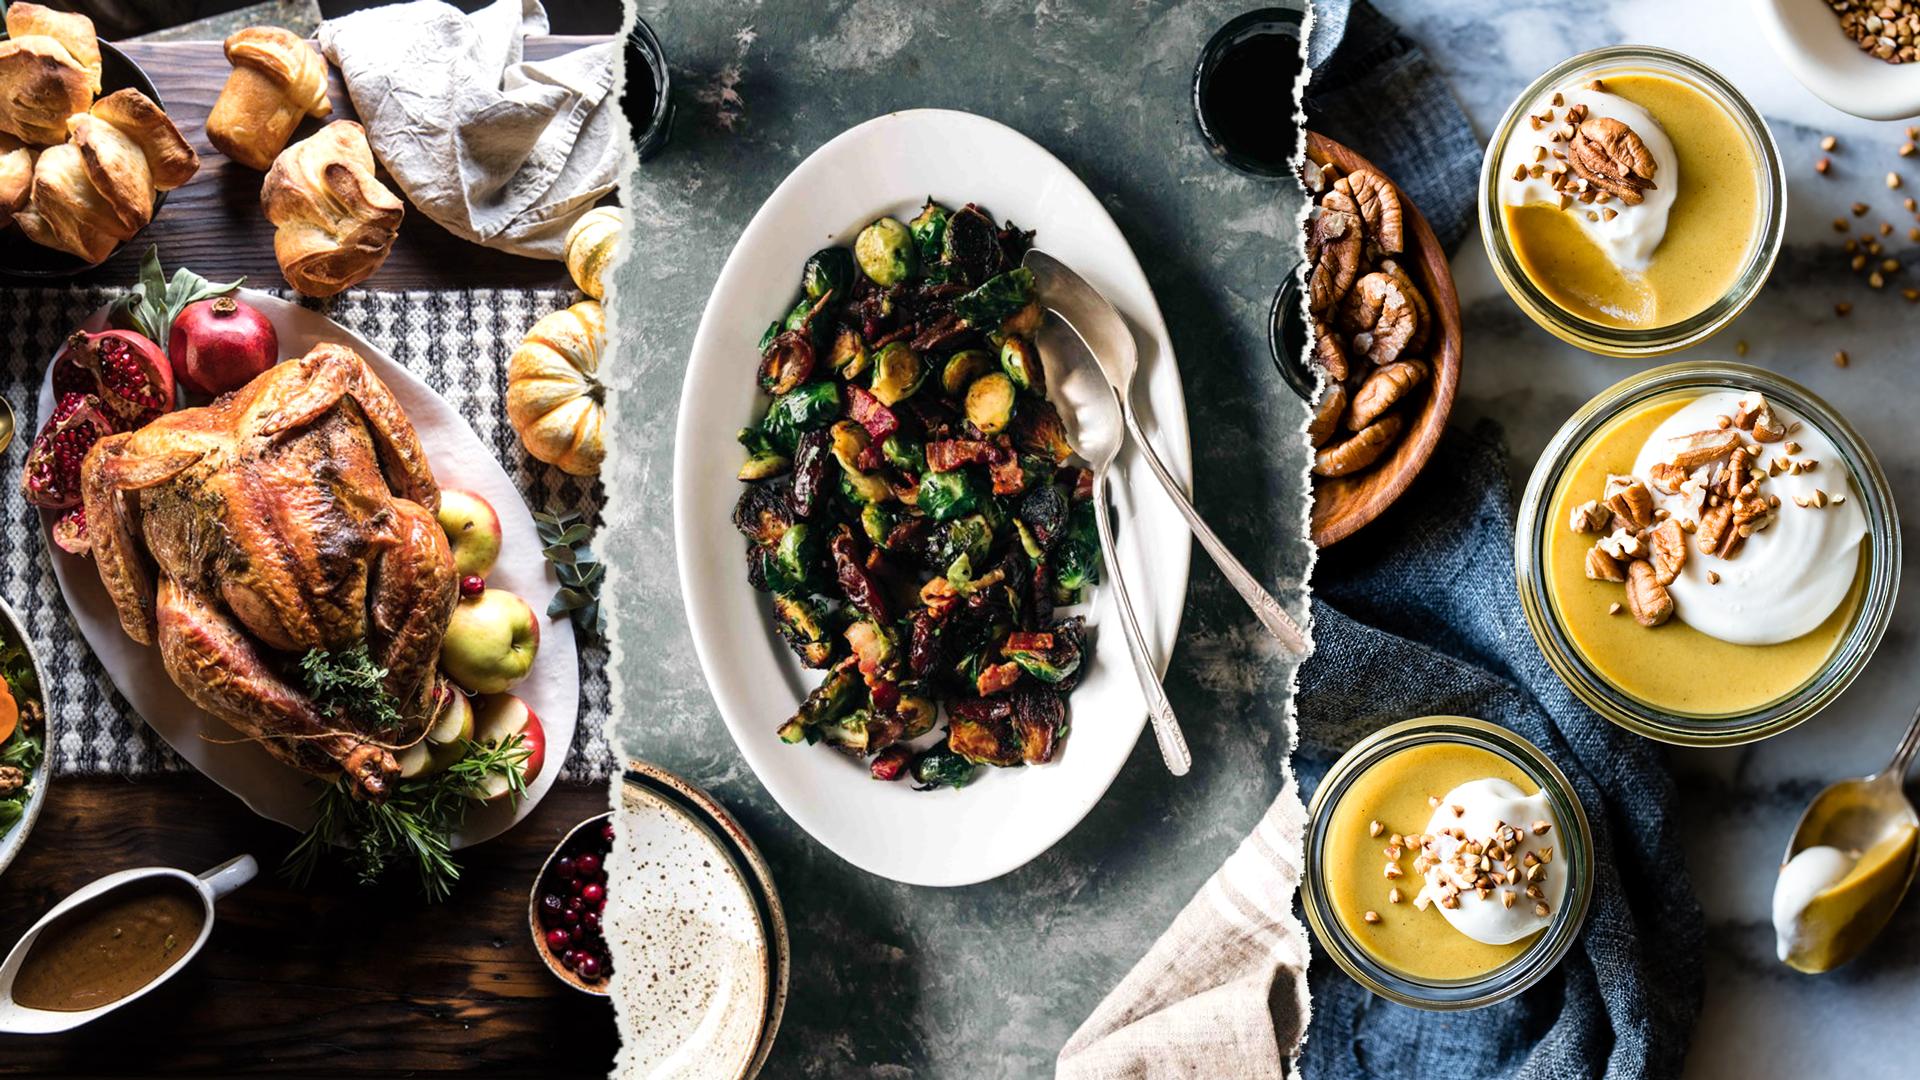 STYLECASTER | 50 Best Thanksgiving Recipe Ideas